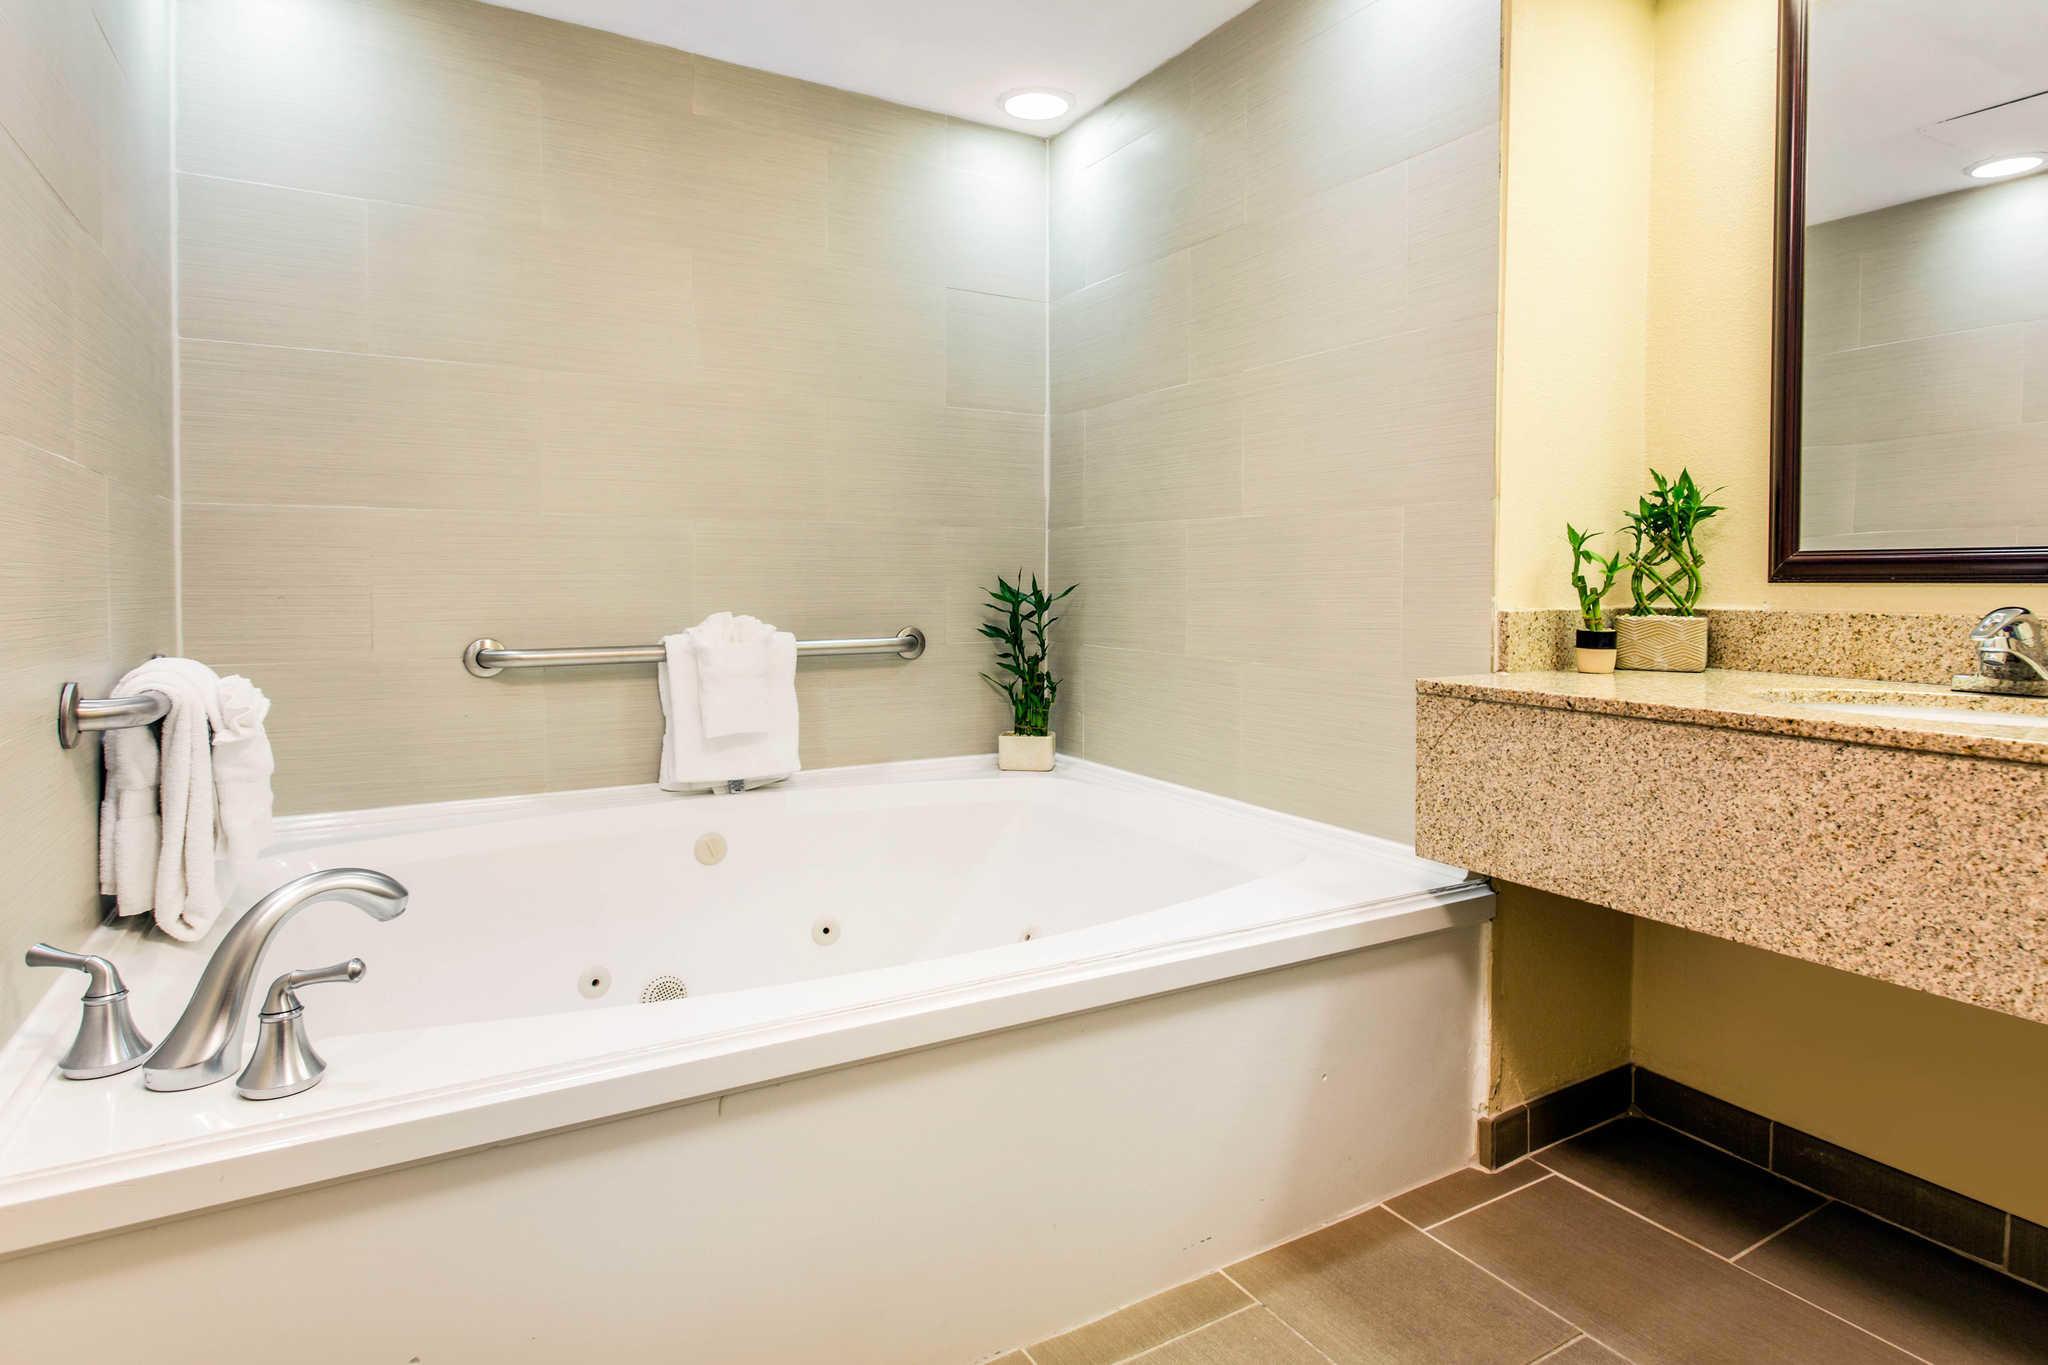 Comfort Inn & Suites Crabtree Valley image 31